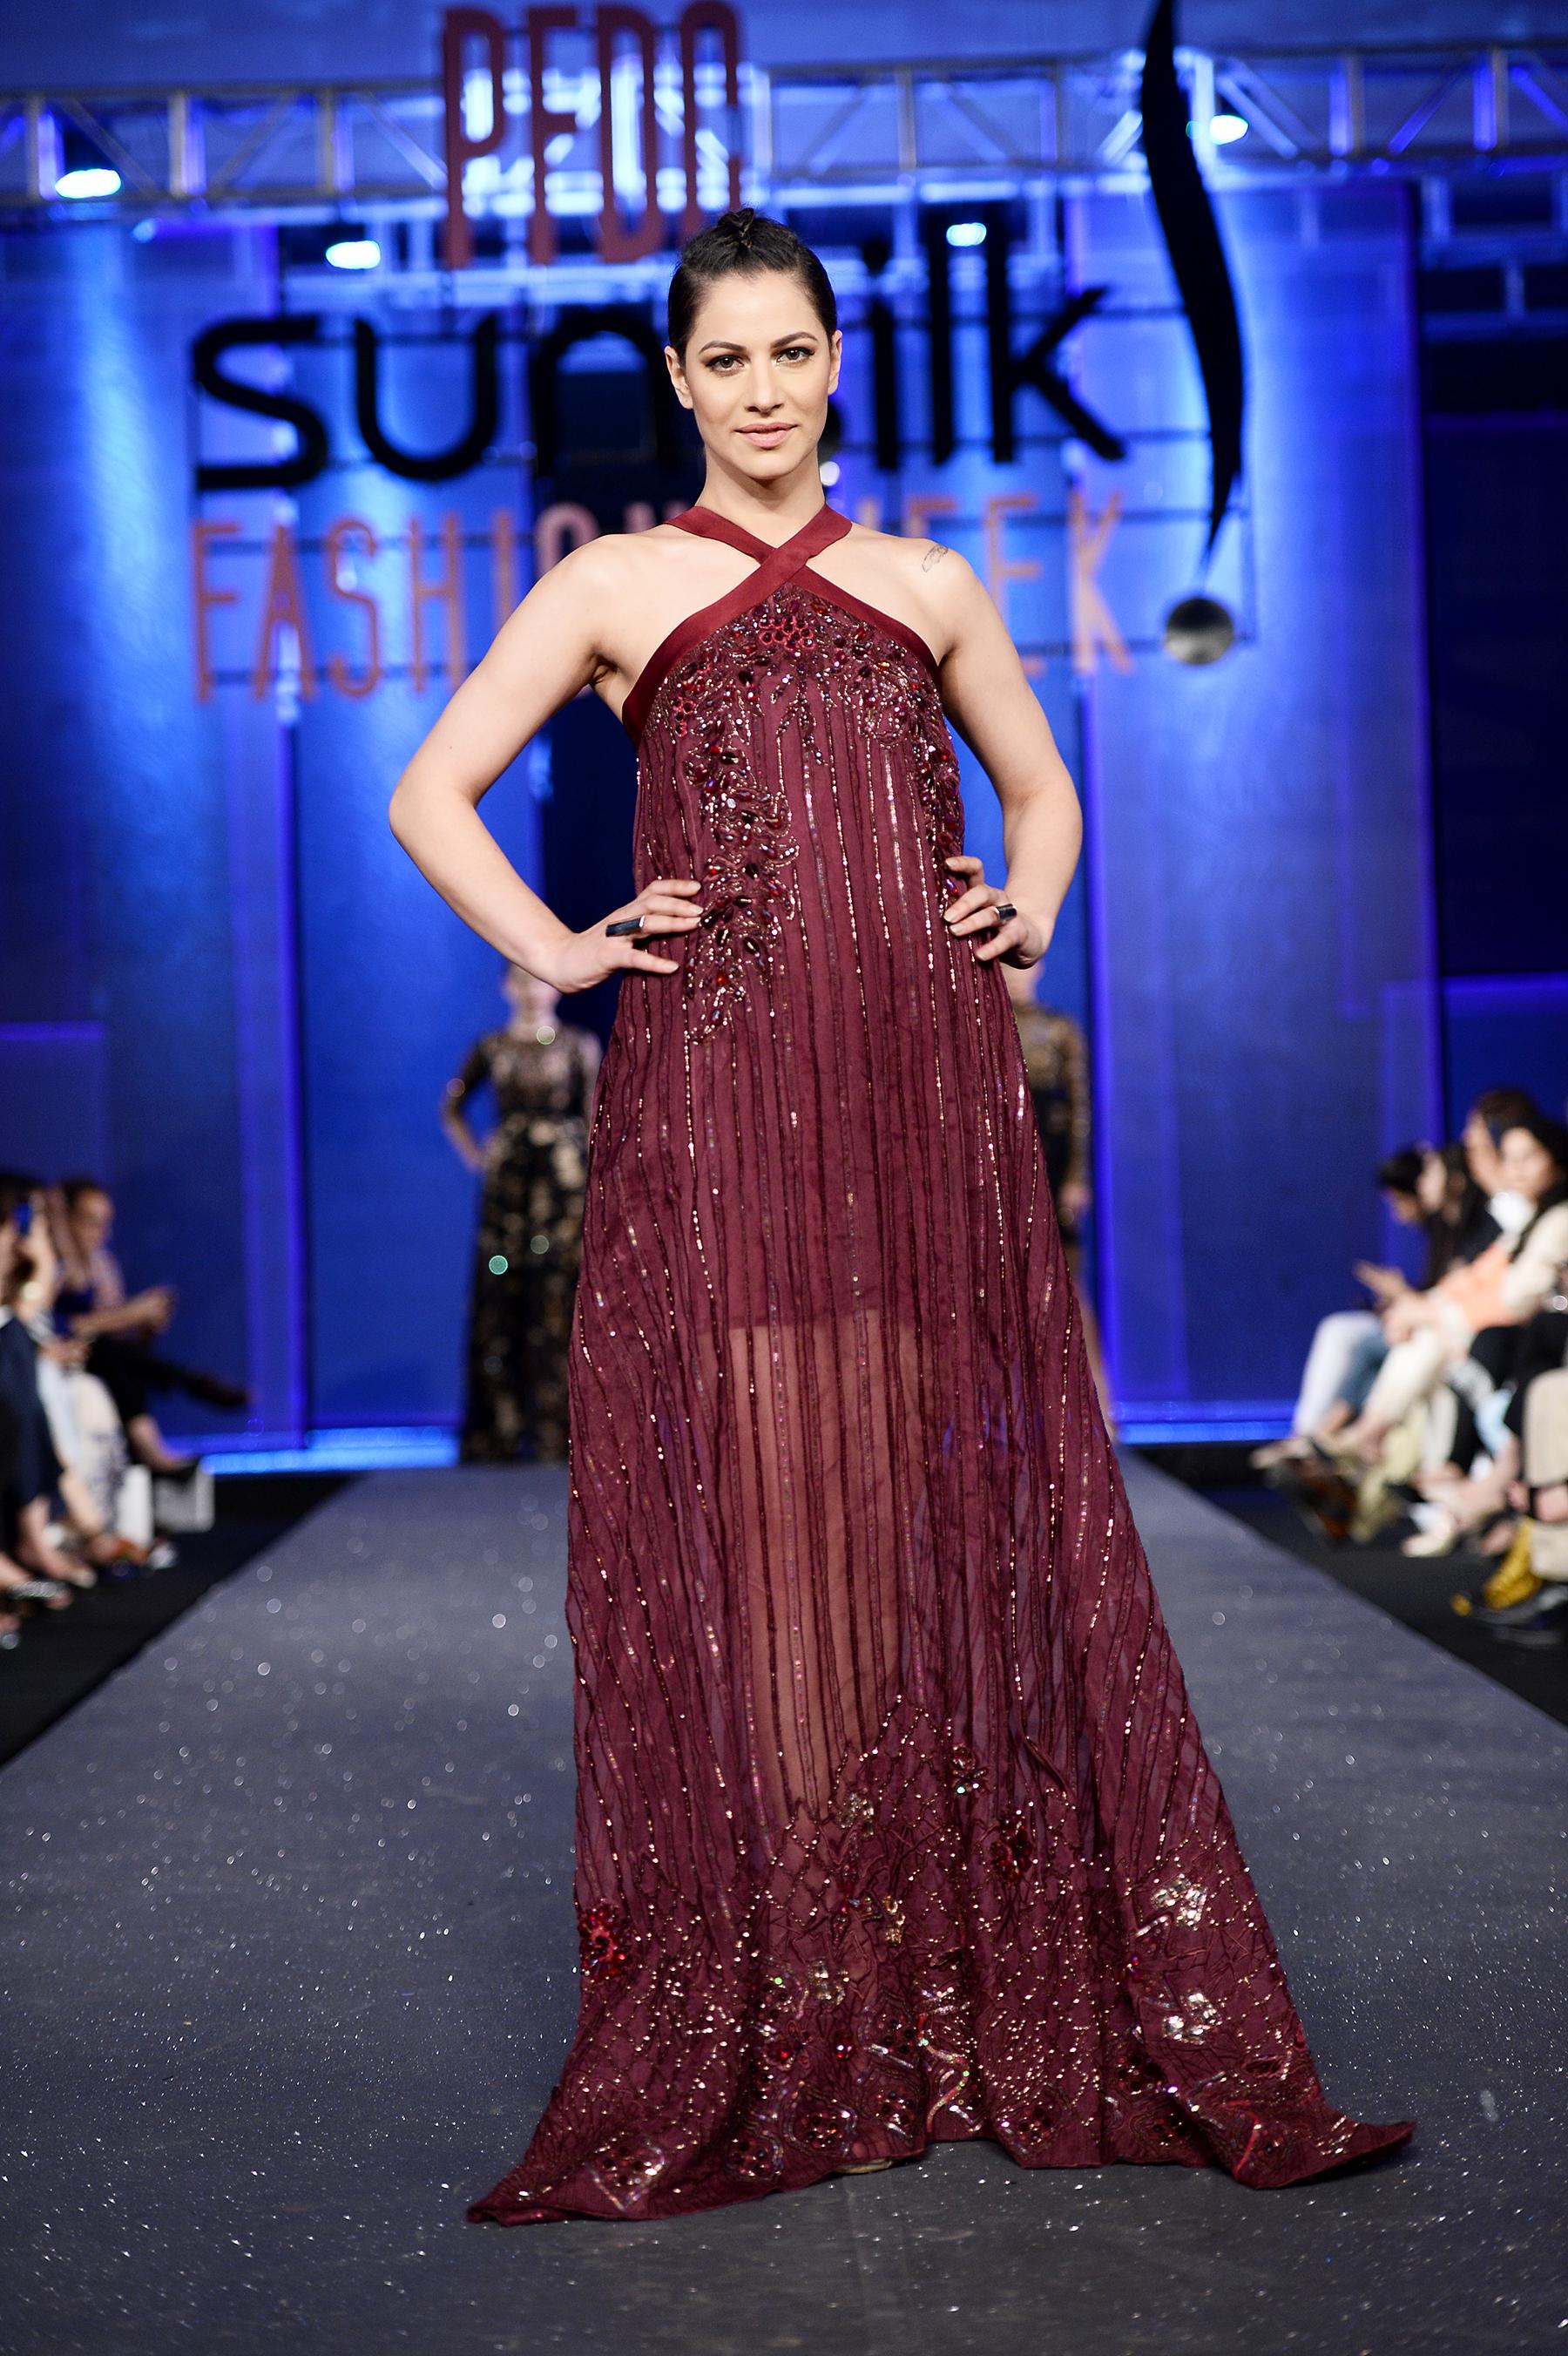 Tena Durrani - PFDC Sunsilk Fashion Week 2017, Photography: Faisal Farooqui and his team at Dragonfly